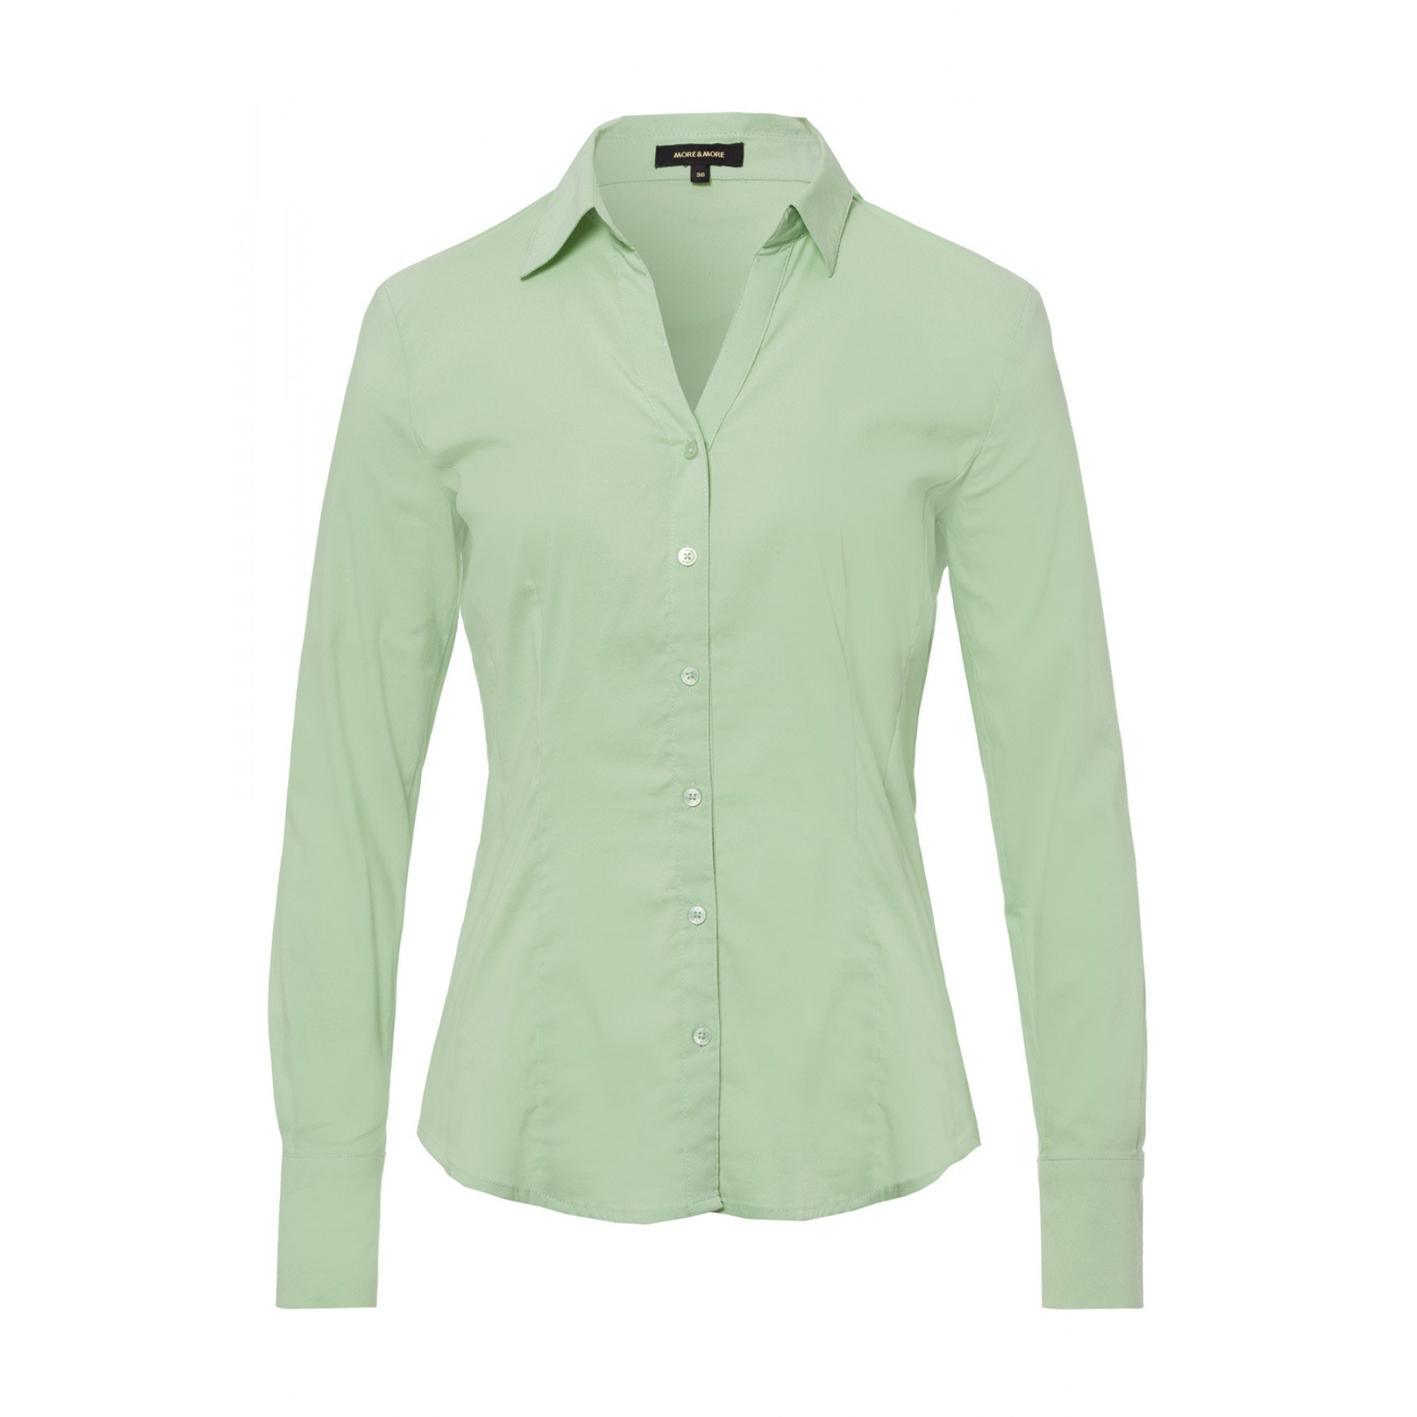 More & More langarm Bluse in grün